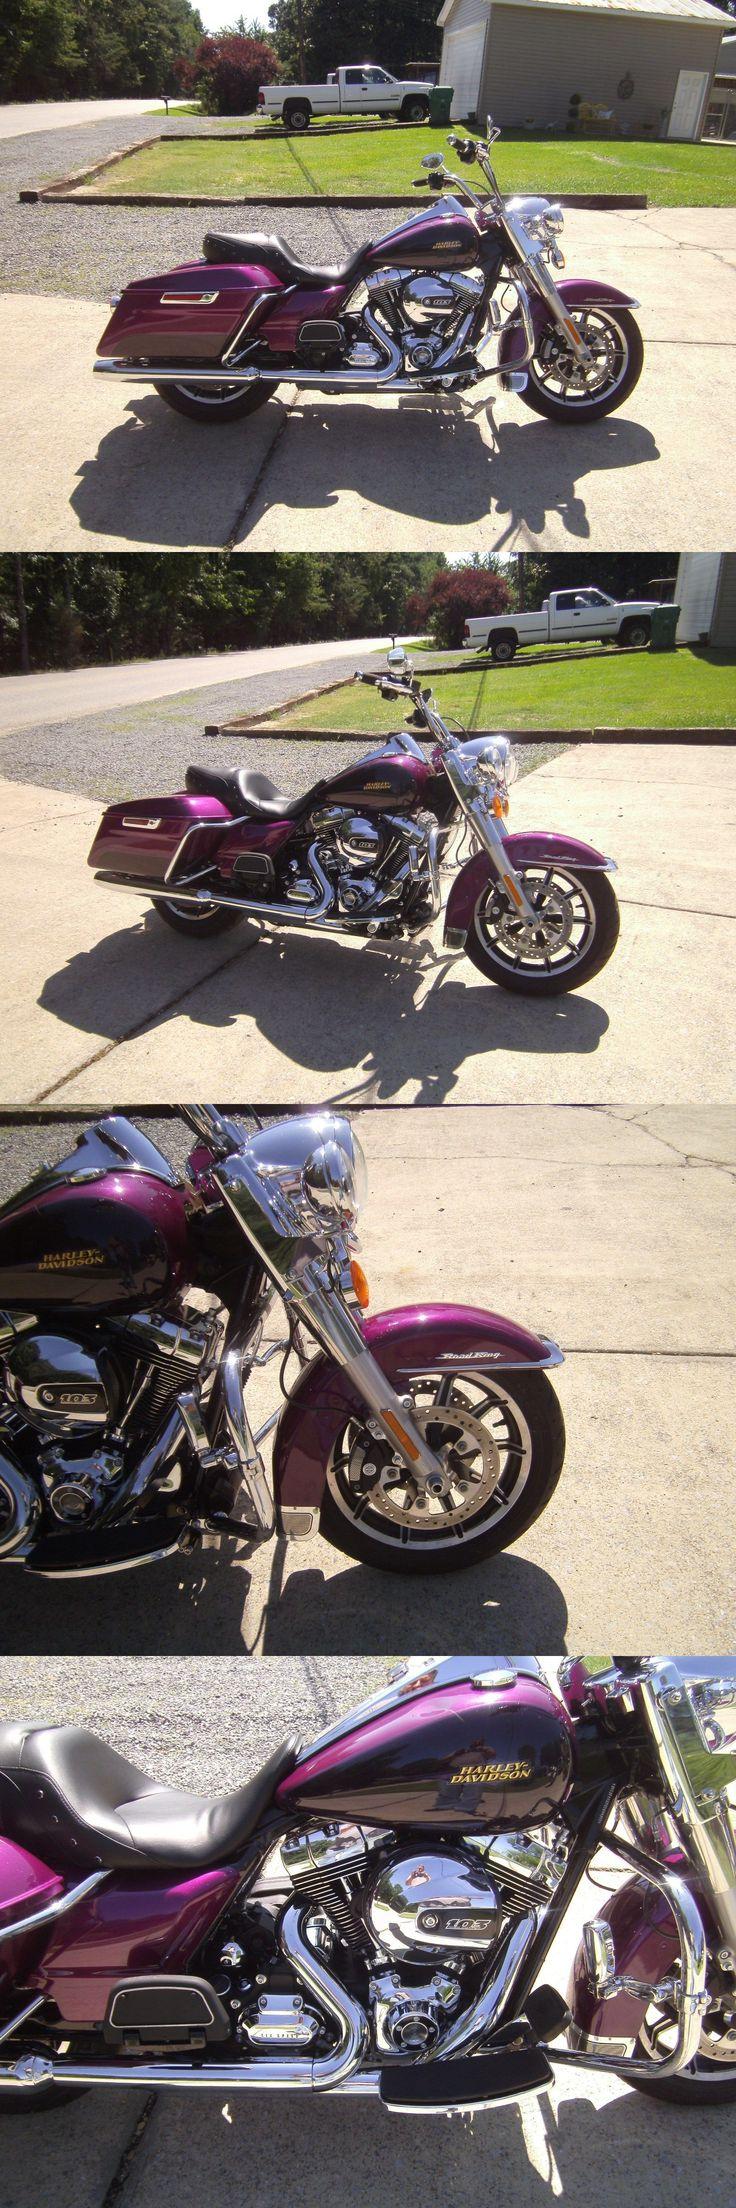 Motorcycles: 2016 Harley-Davidson Touring 2016 Harley Davidson Road King 913 Miles Ez Fix No Frame Or Fork Damage -> BUY IT NOW ONLY: $9995 on eBay!